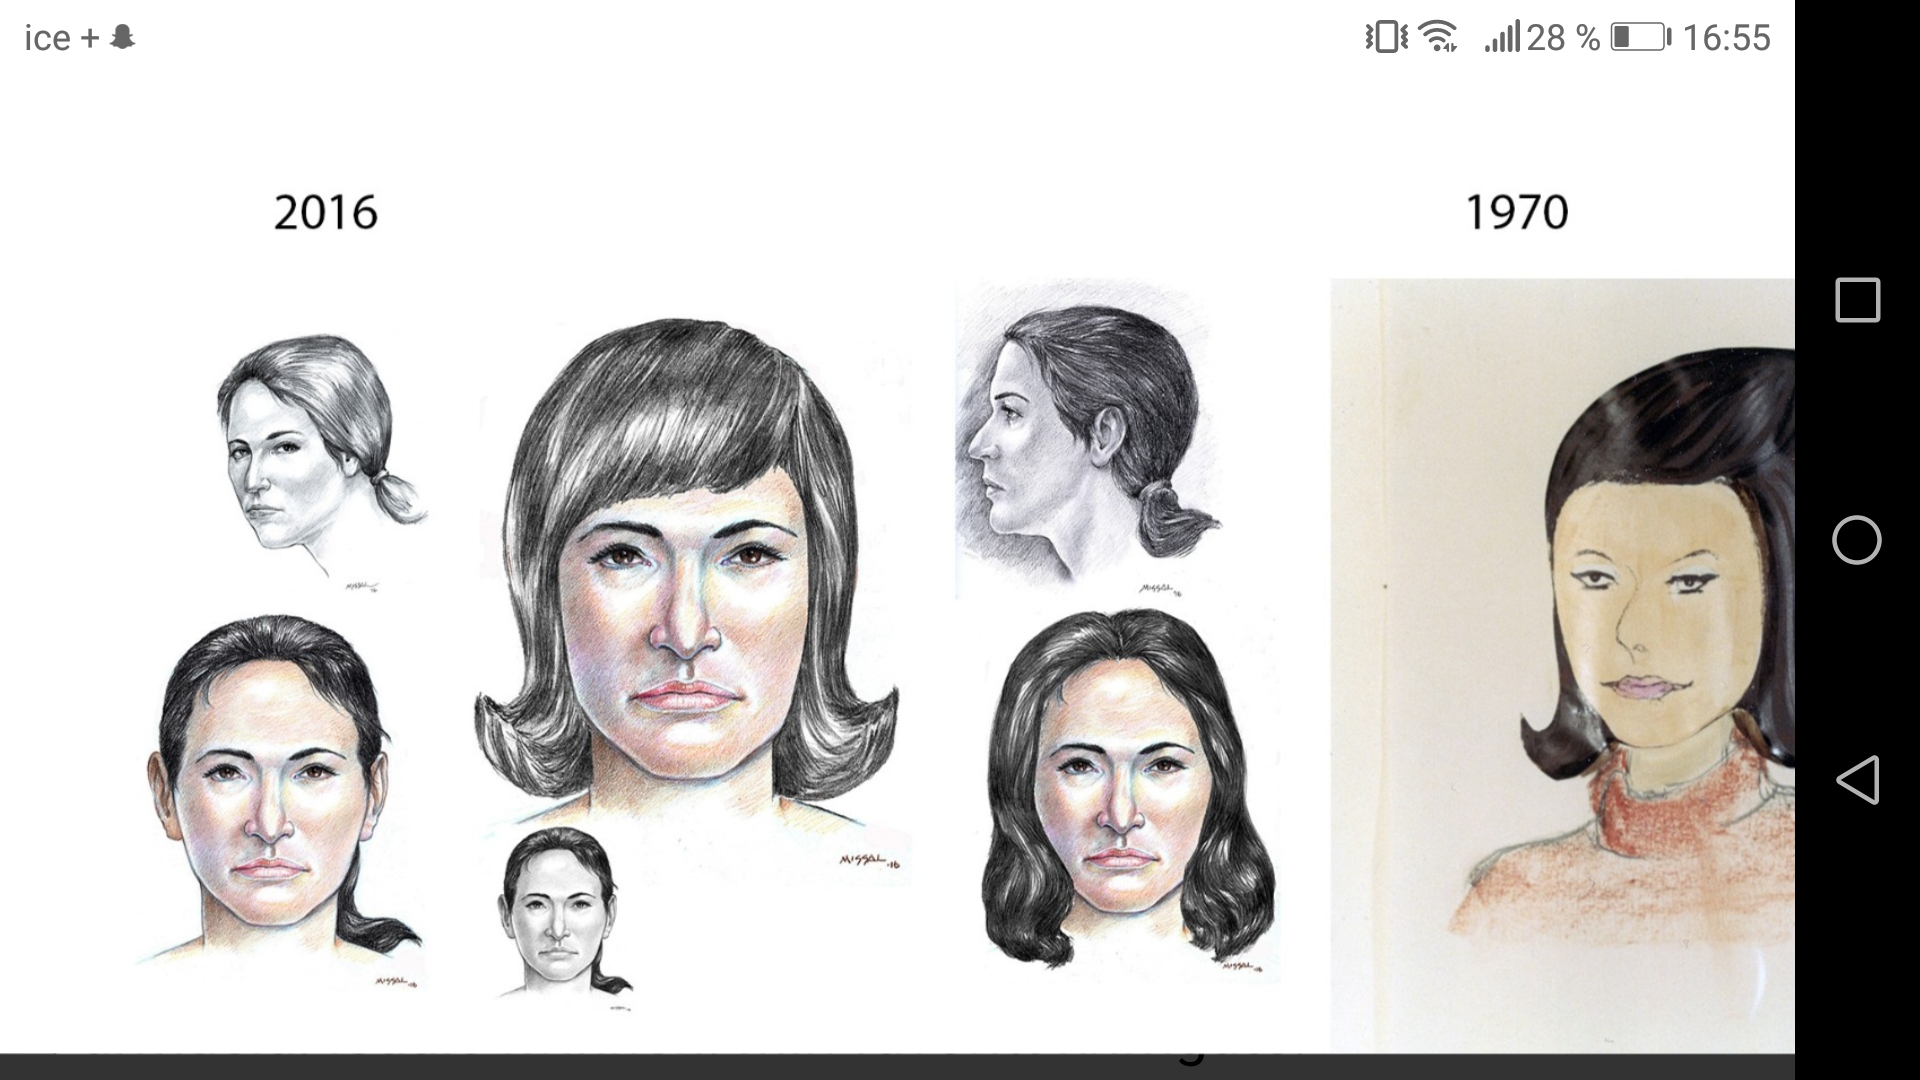 Elisabeth Leenhouwer, Claudia Tielt, Vera Schlosseneck, Finella Lorch, Geneviève Lancier, Alexia Zarna-Merchez, Claudia Nielsen et Vera Jarle.